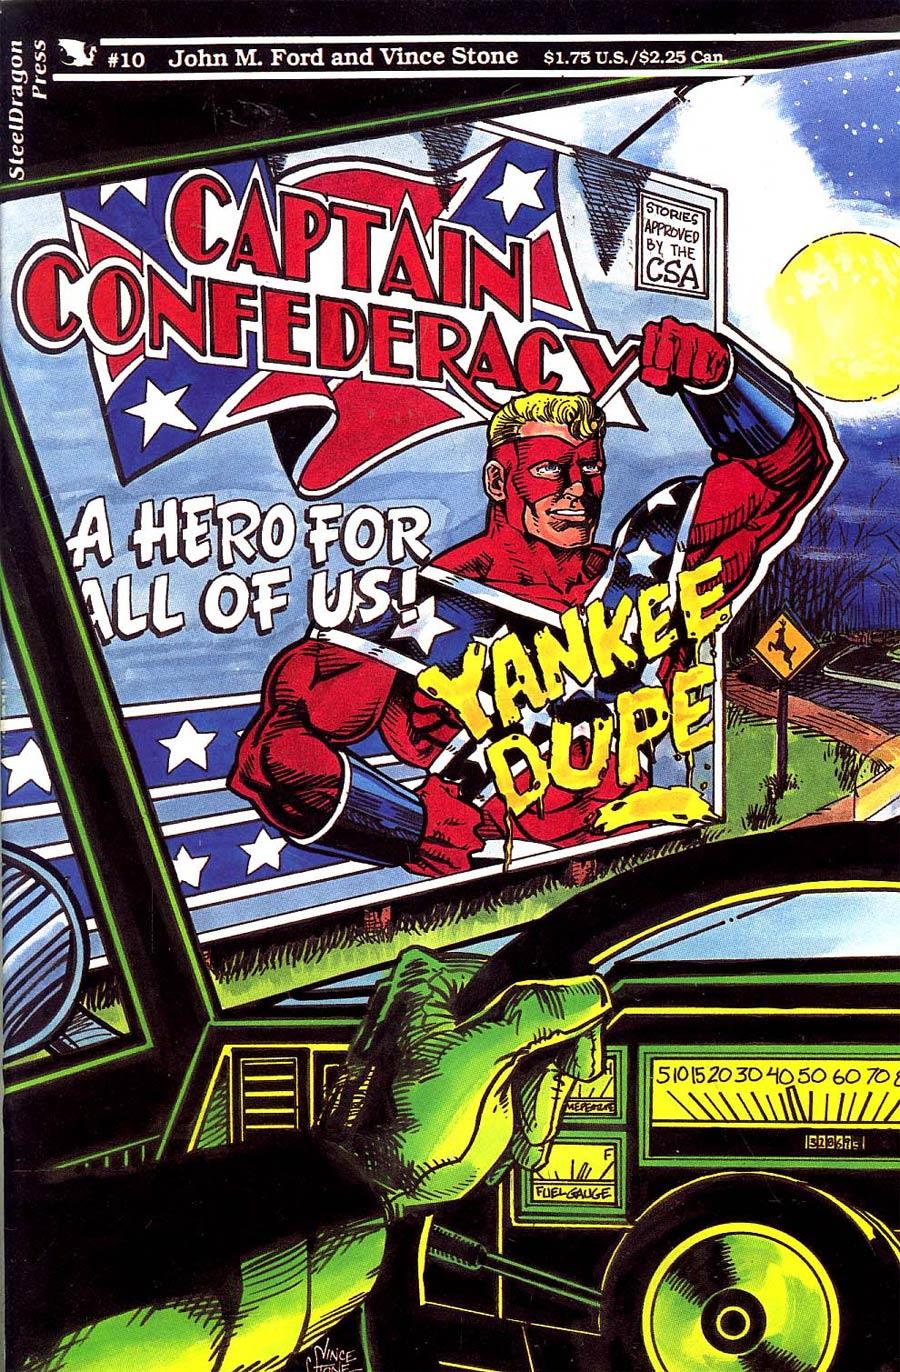 Captain Confederacy #10